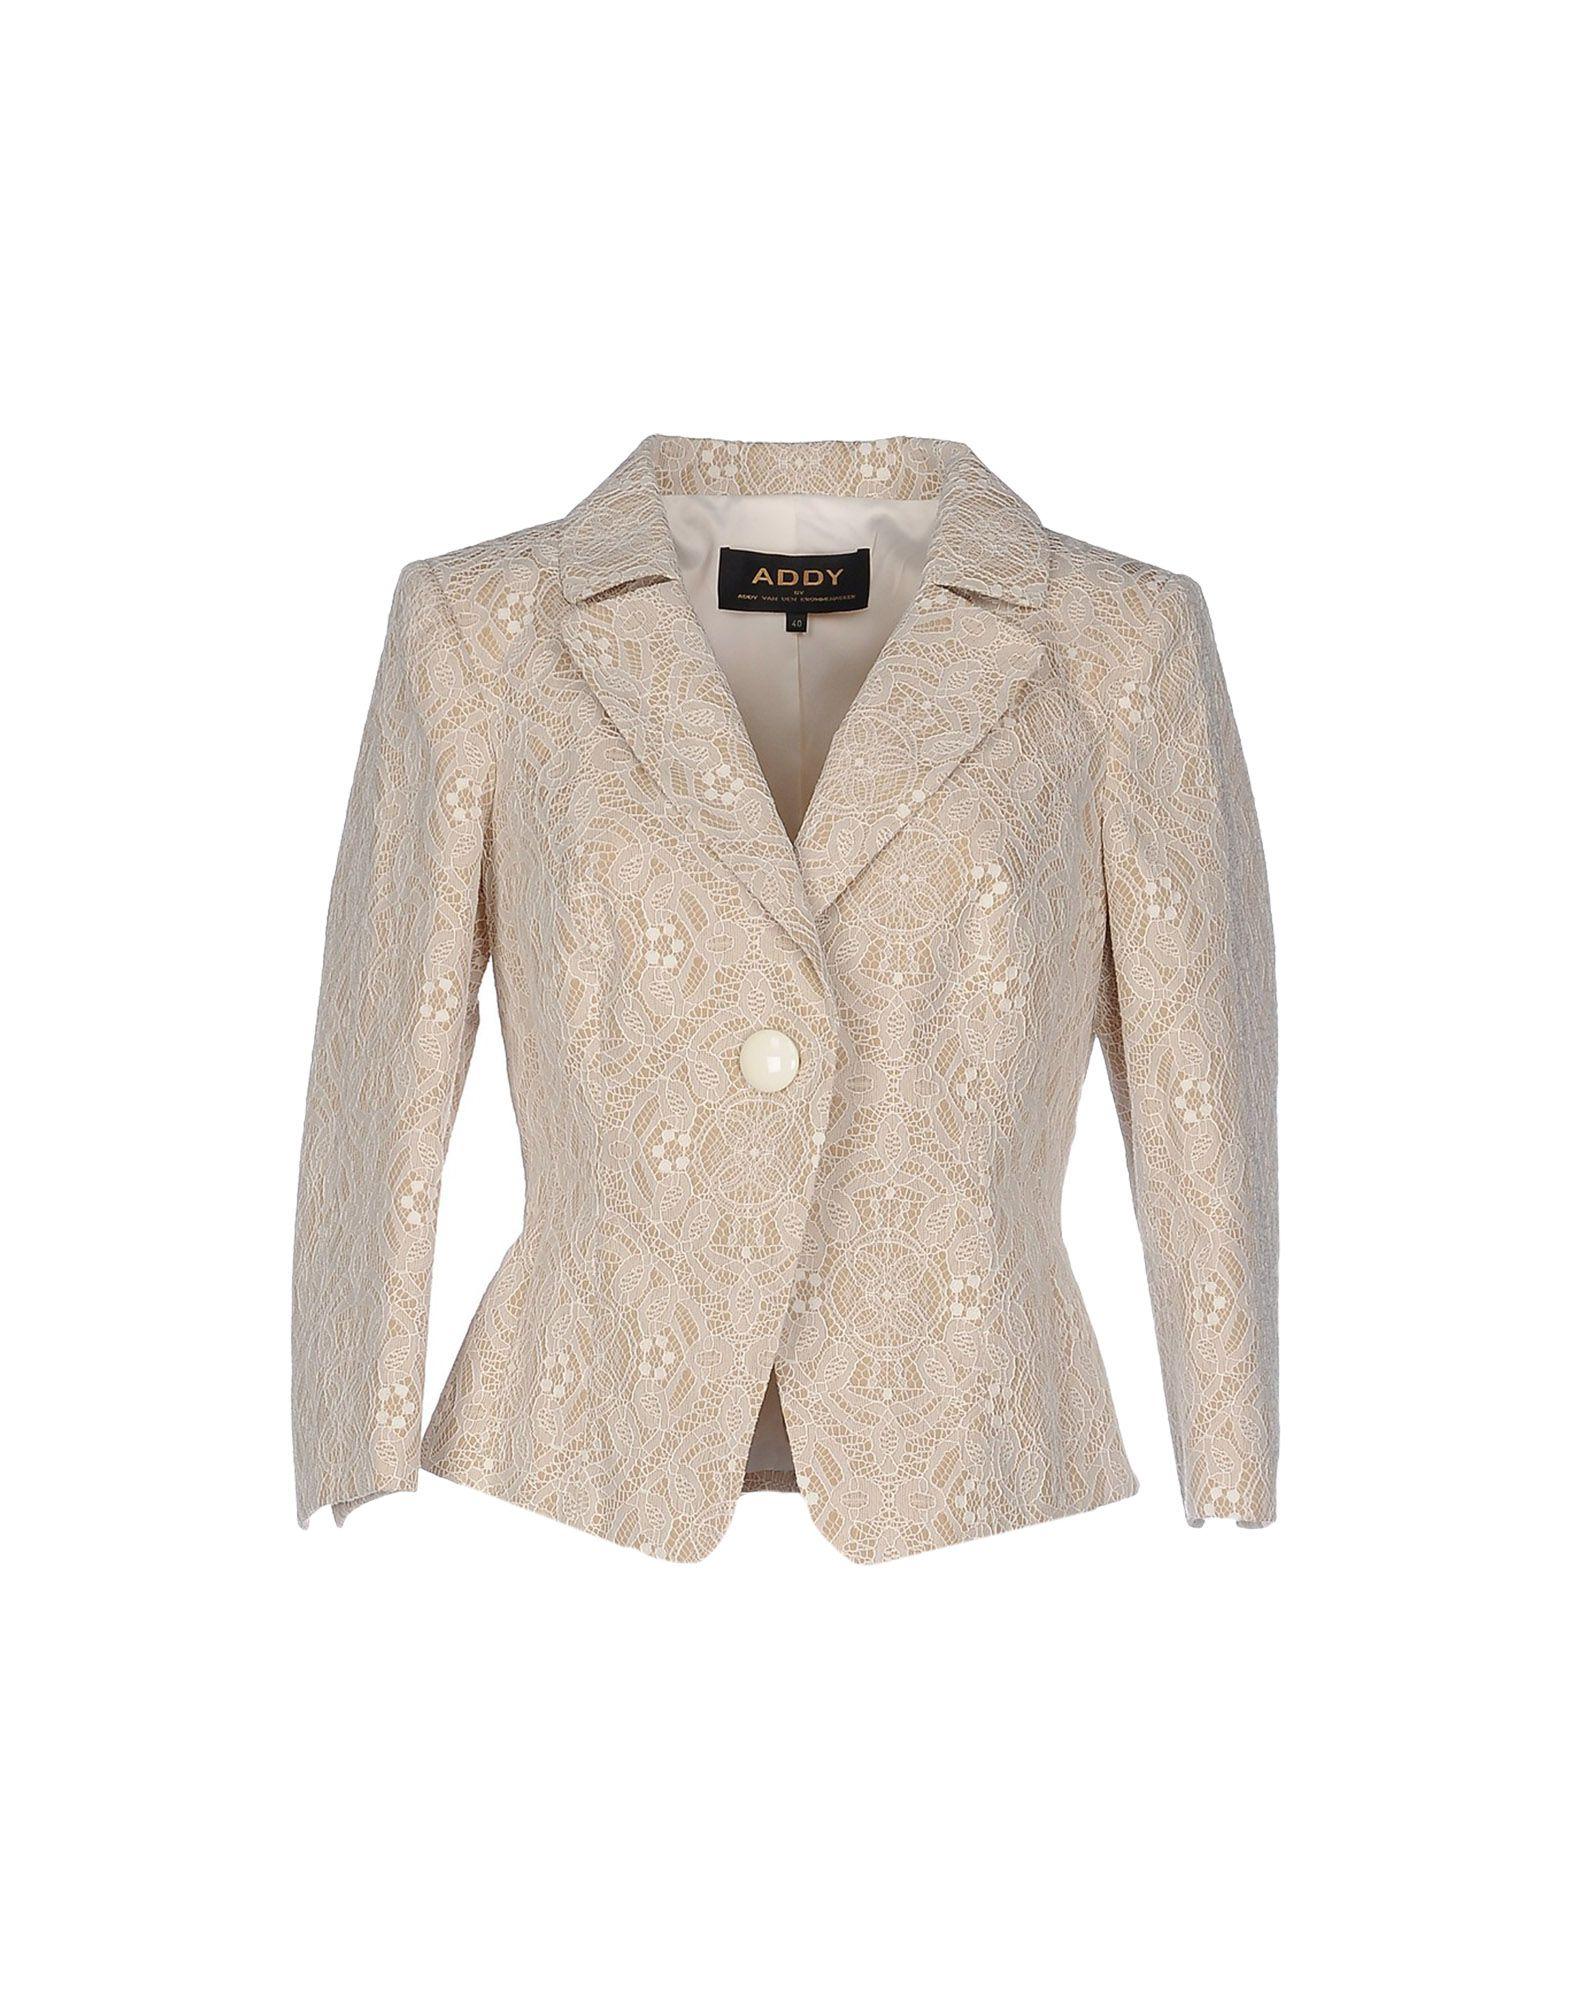 Заказать куртку Самара